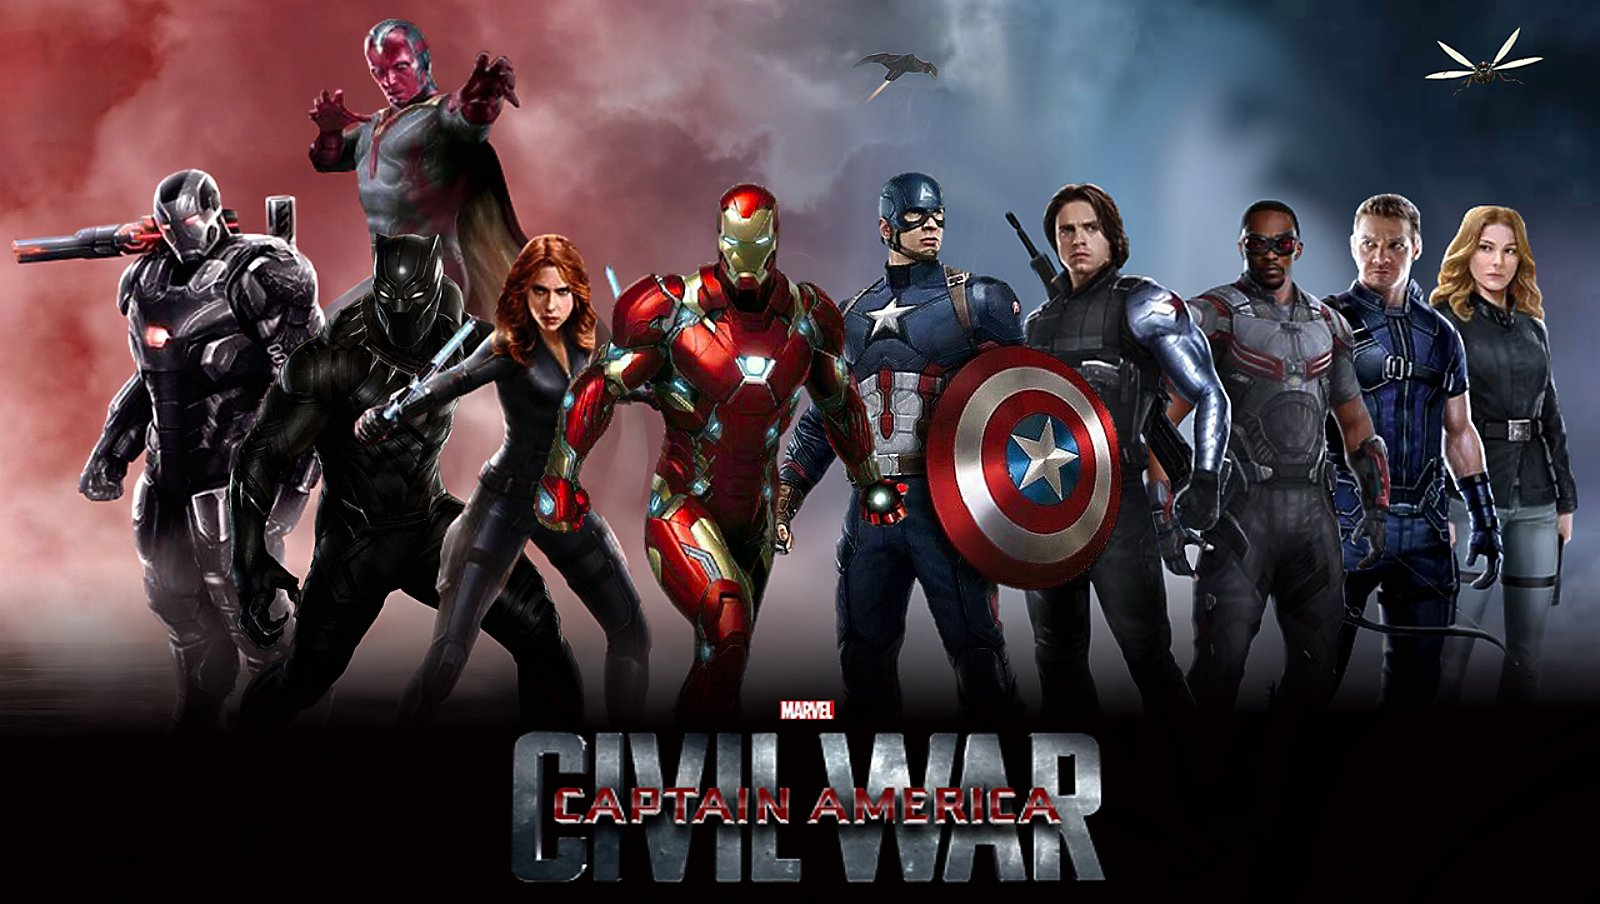 CAPTAIN AMERICA 3 Civil War marvel superhero action fighting 1cacw 1600x904